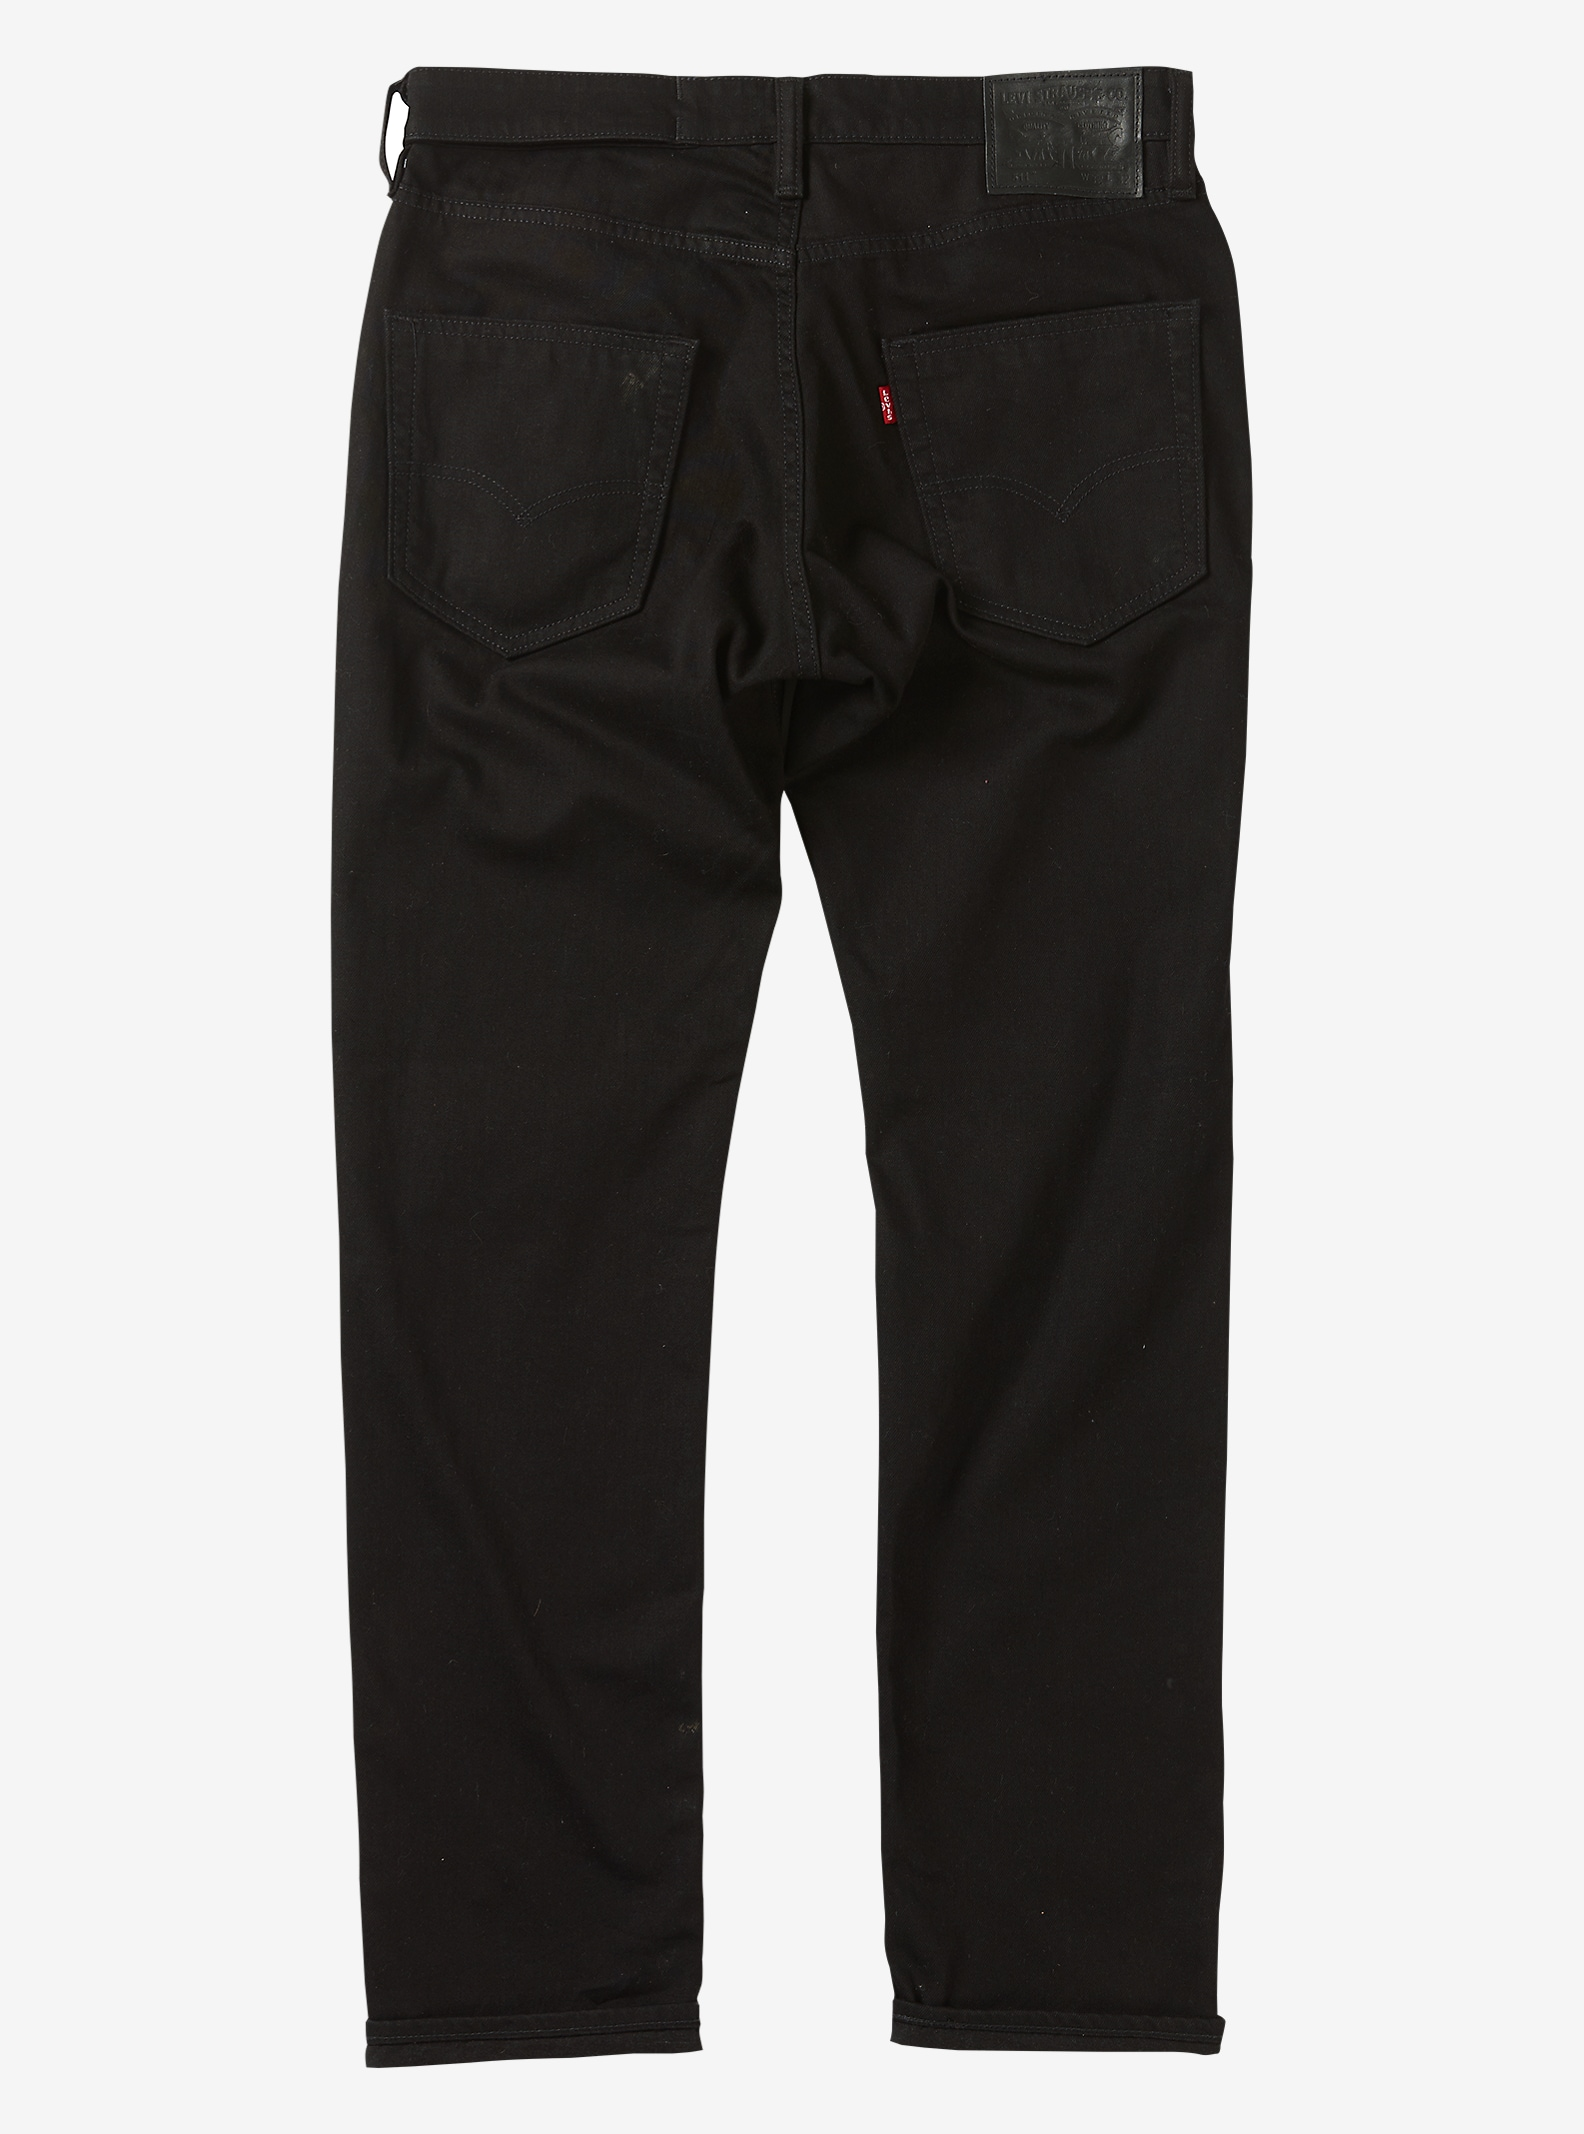 Levi's® Commuter™ 511™ Slim Fit Jean shown in Black